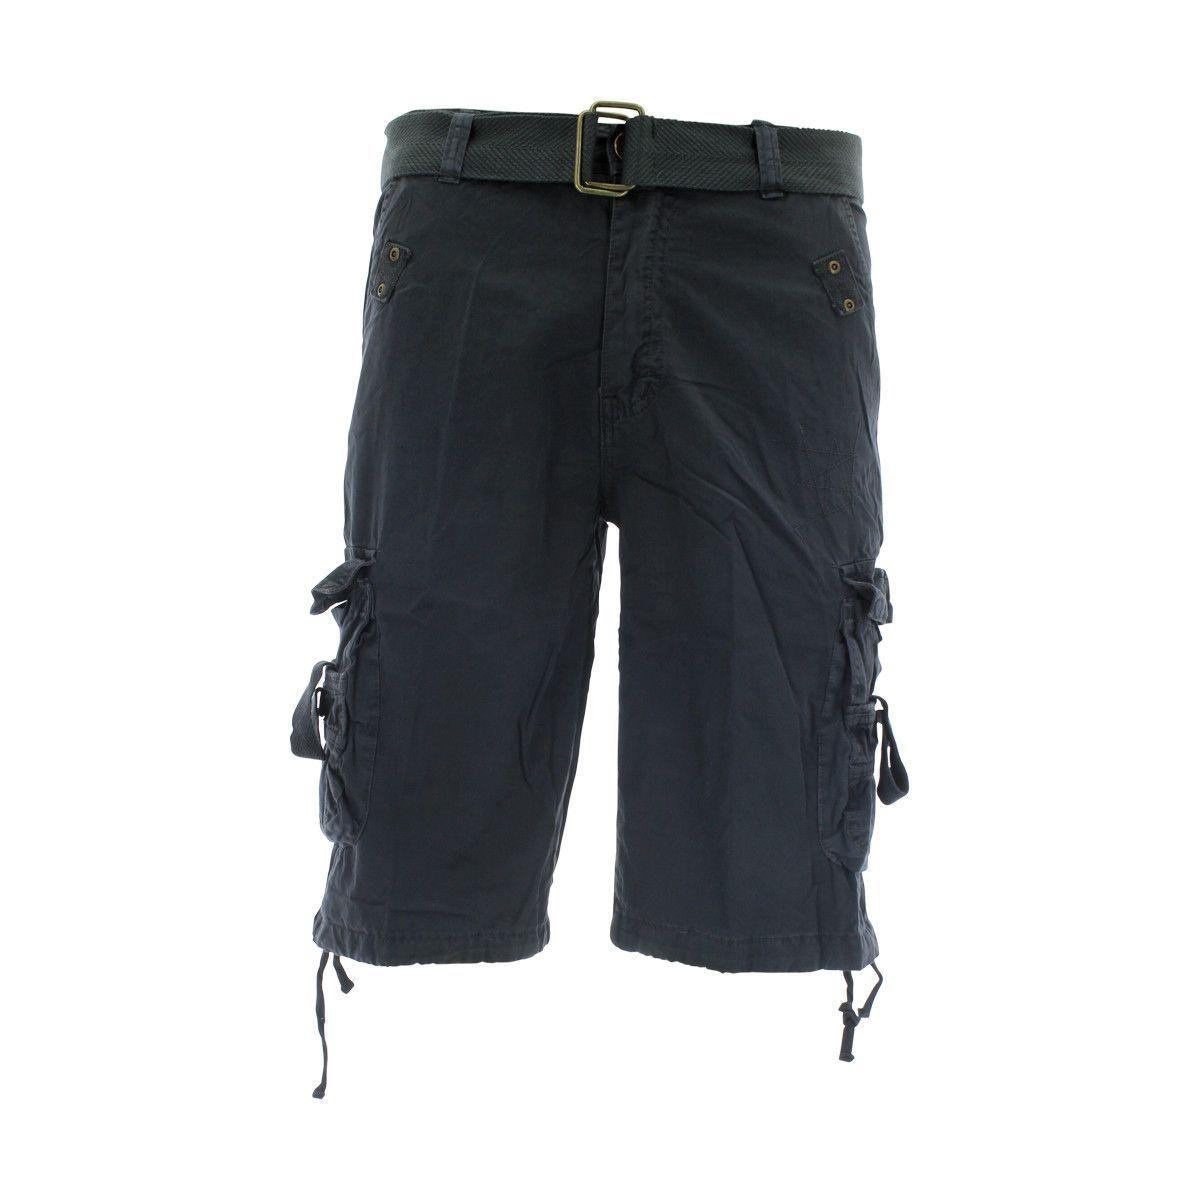 Swiss Cross - Men's Belted Cargo Shorts - Charcoal